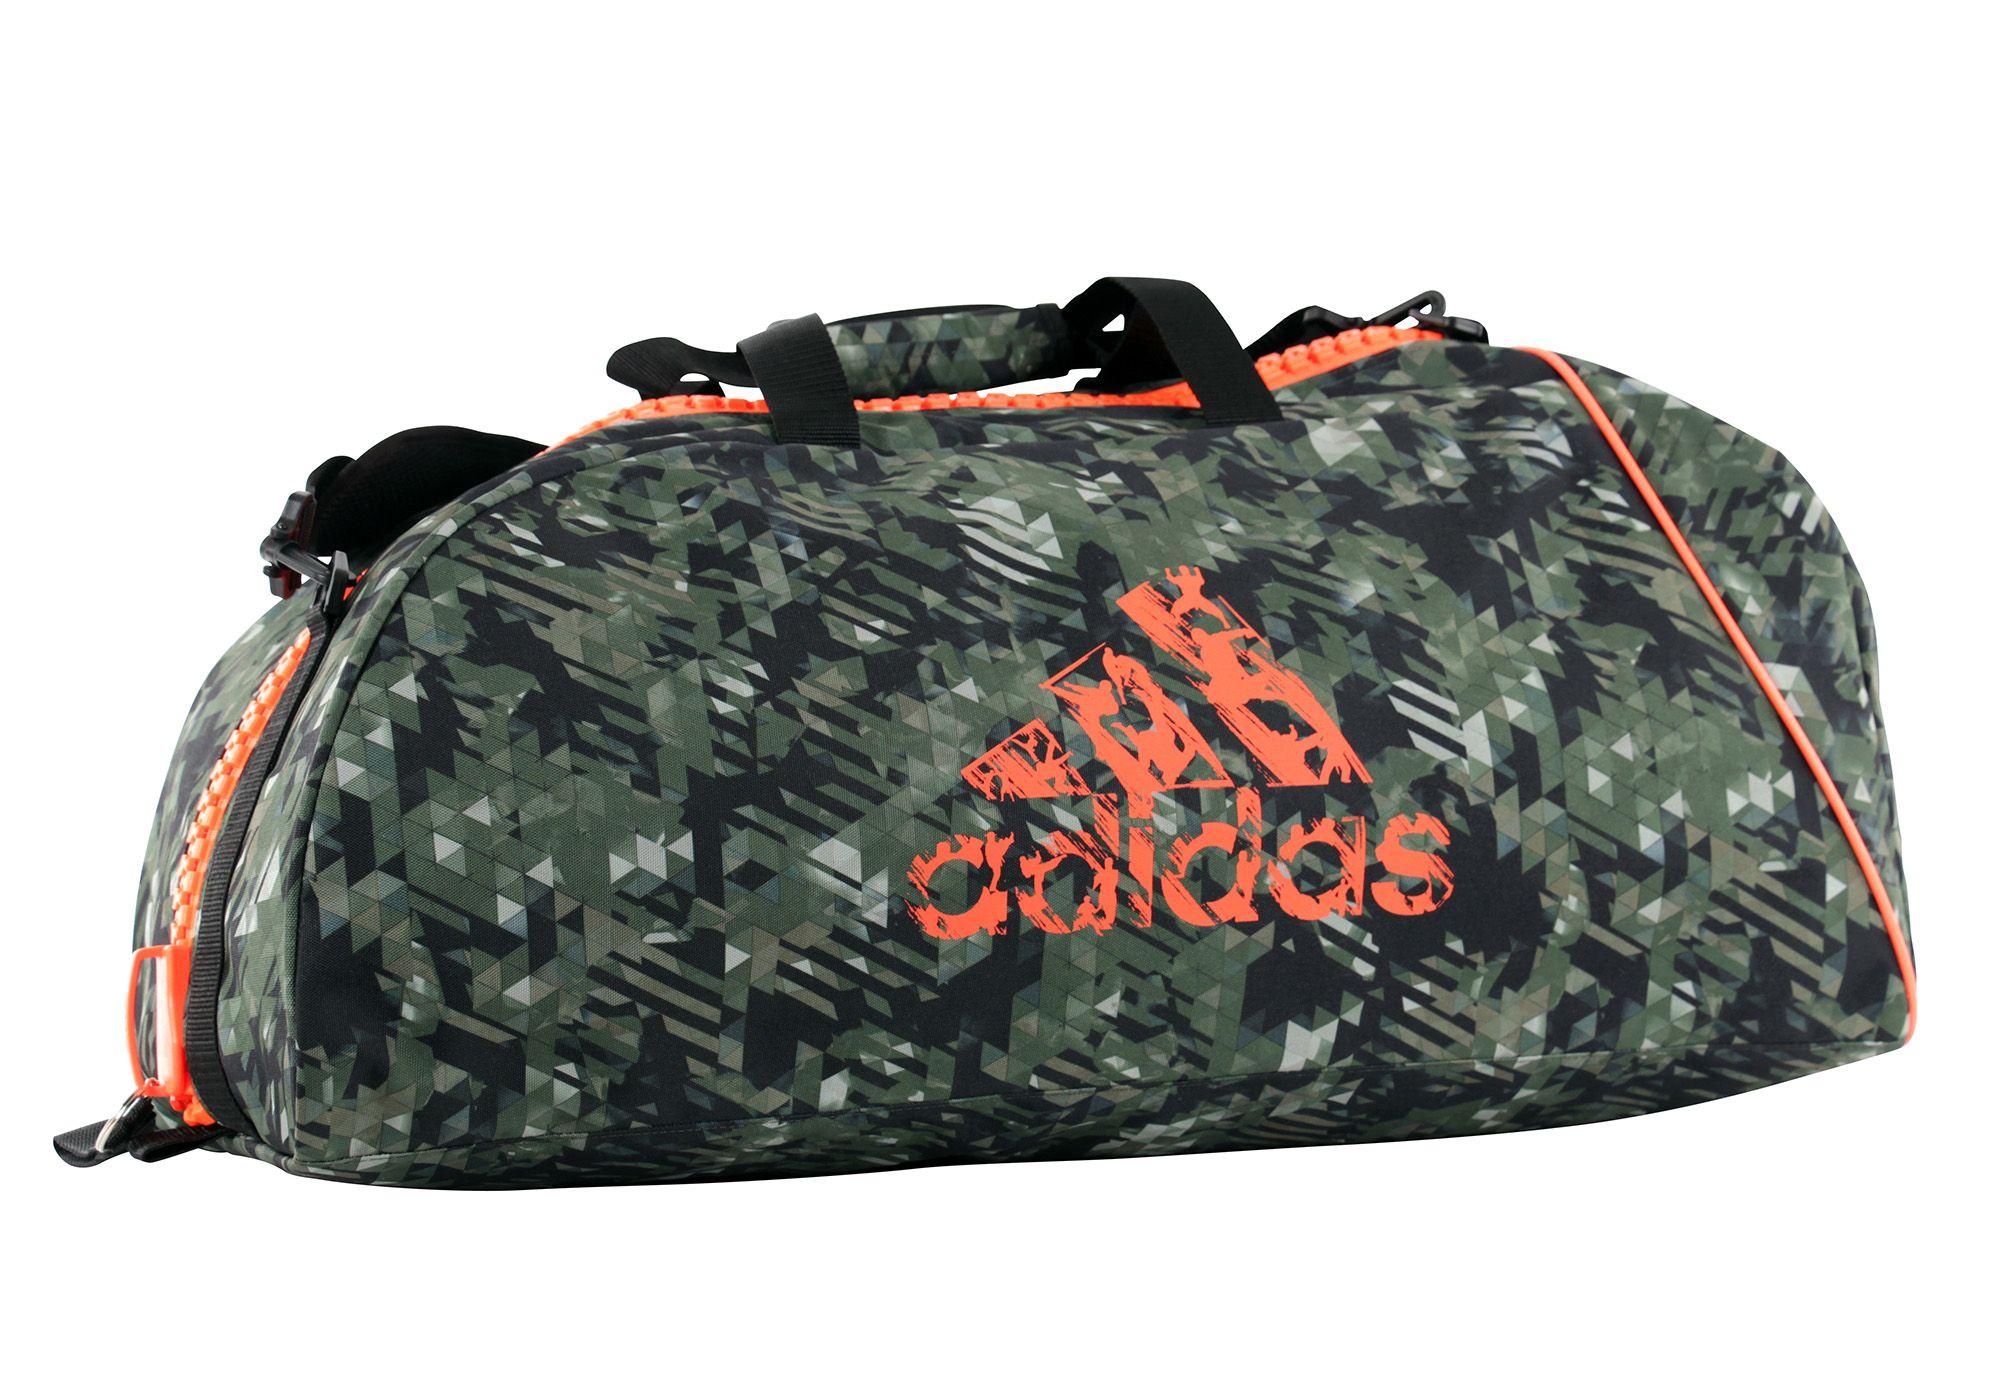 ADIDAS PERFORMANCE adidas Performance Sporttasche, »Combat Camo Bag«